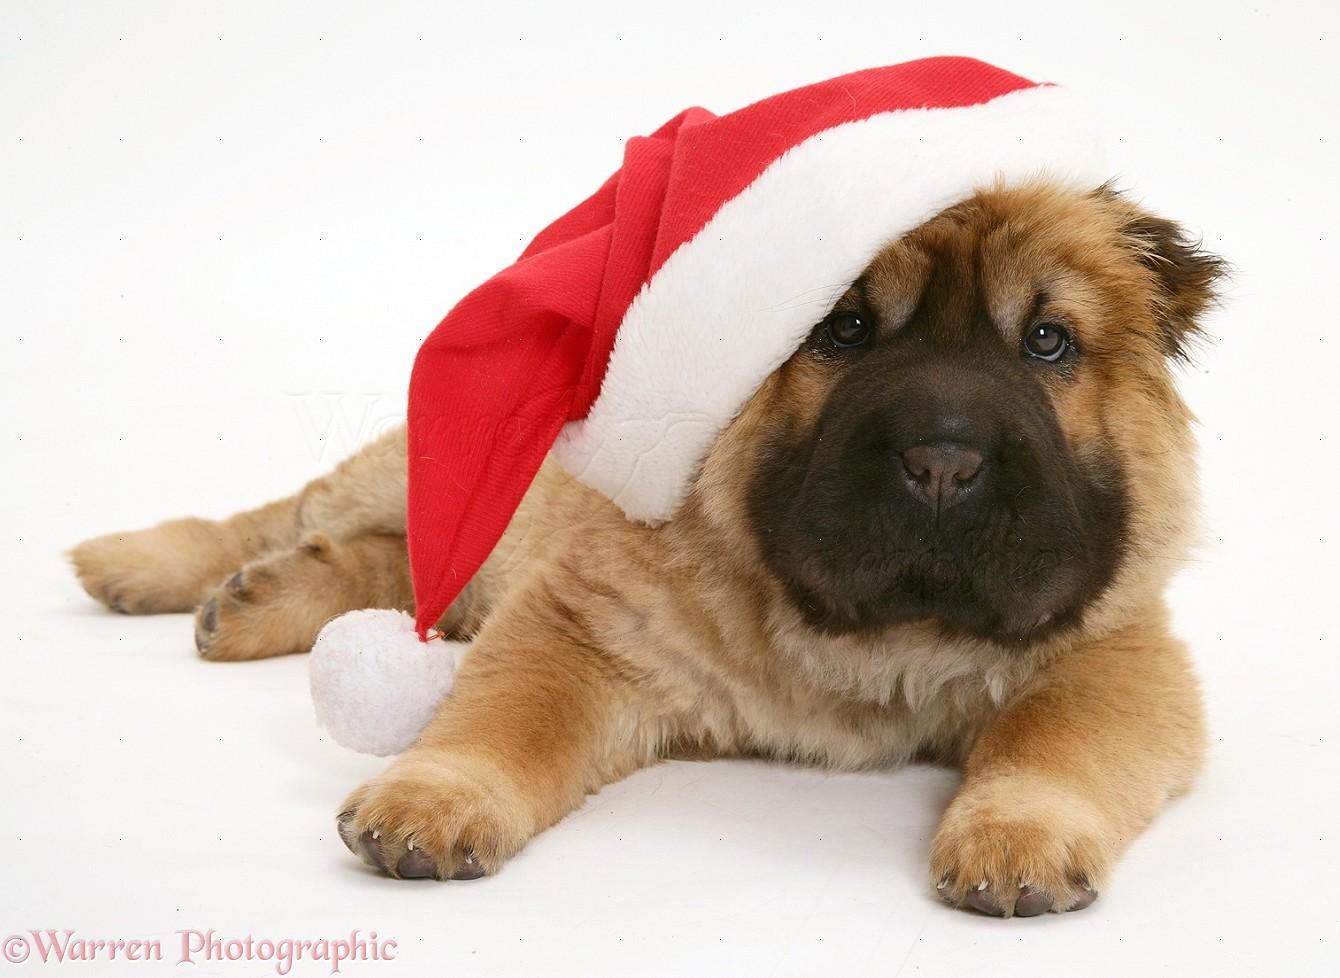 Dog Photos, Dog Pictures, Puppy Photos, Puppy